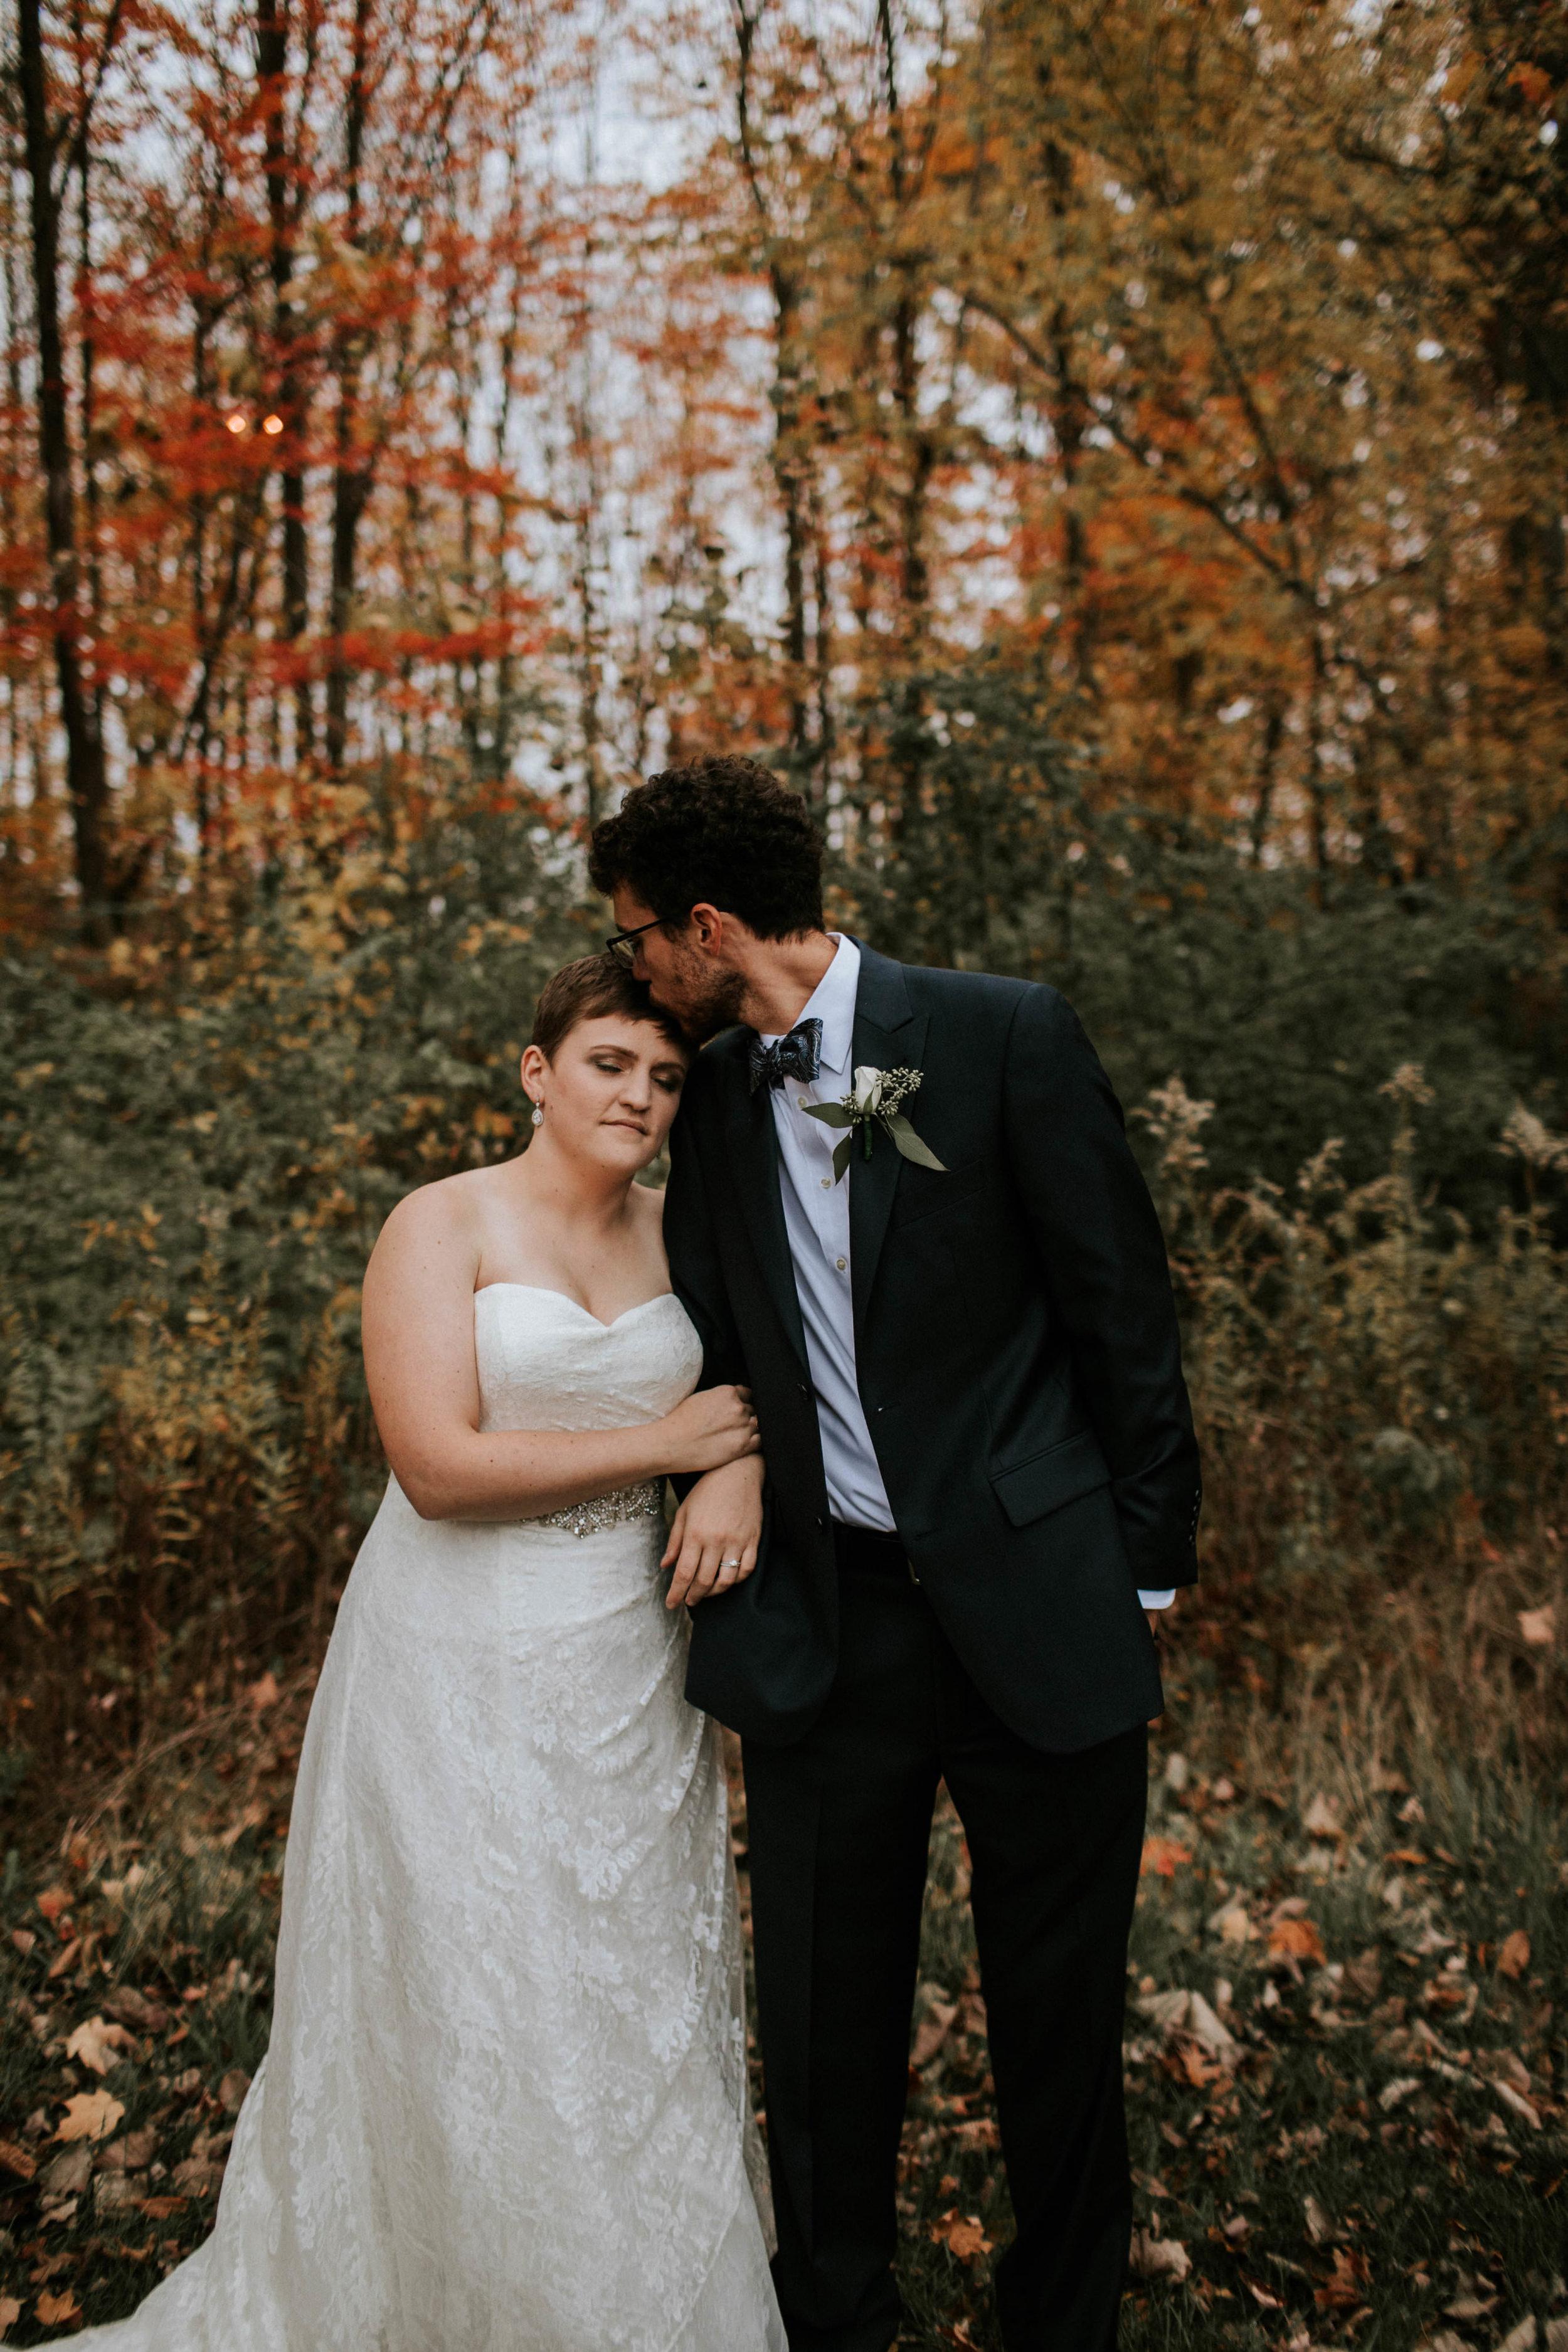 Columbus ohio wedding photographer grace e jones photography real fun joyful wedding56.jpg